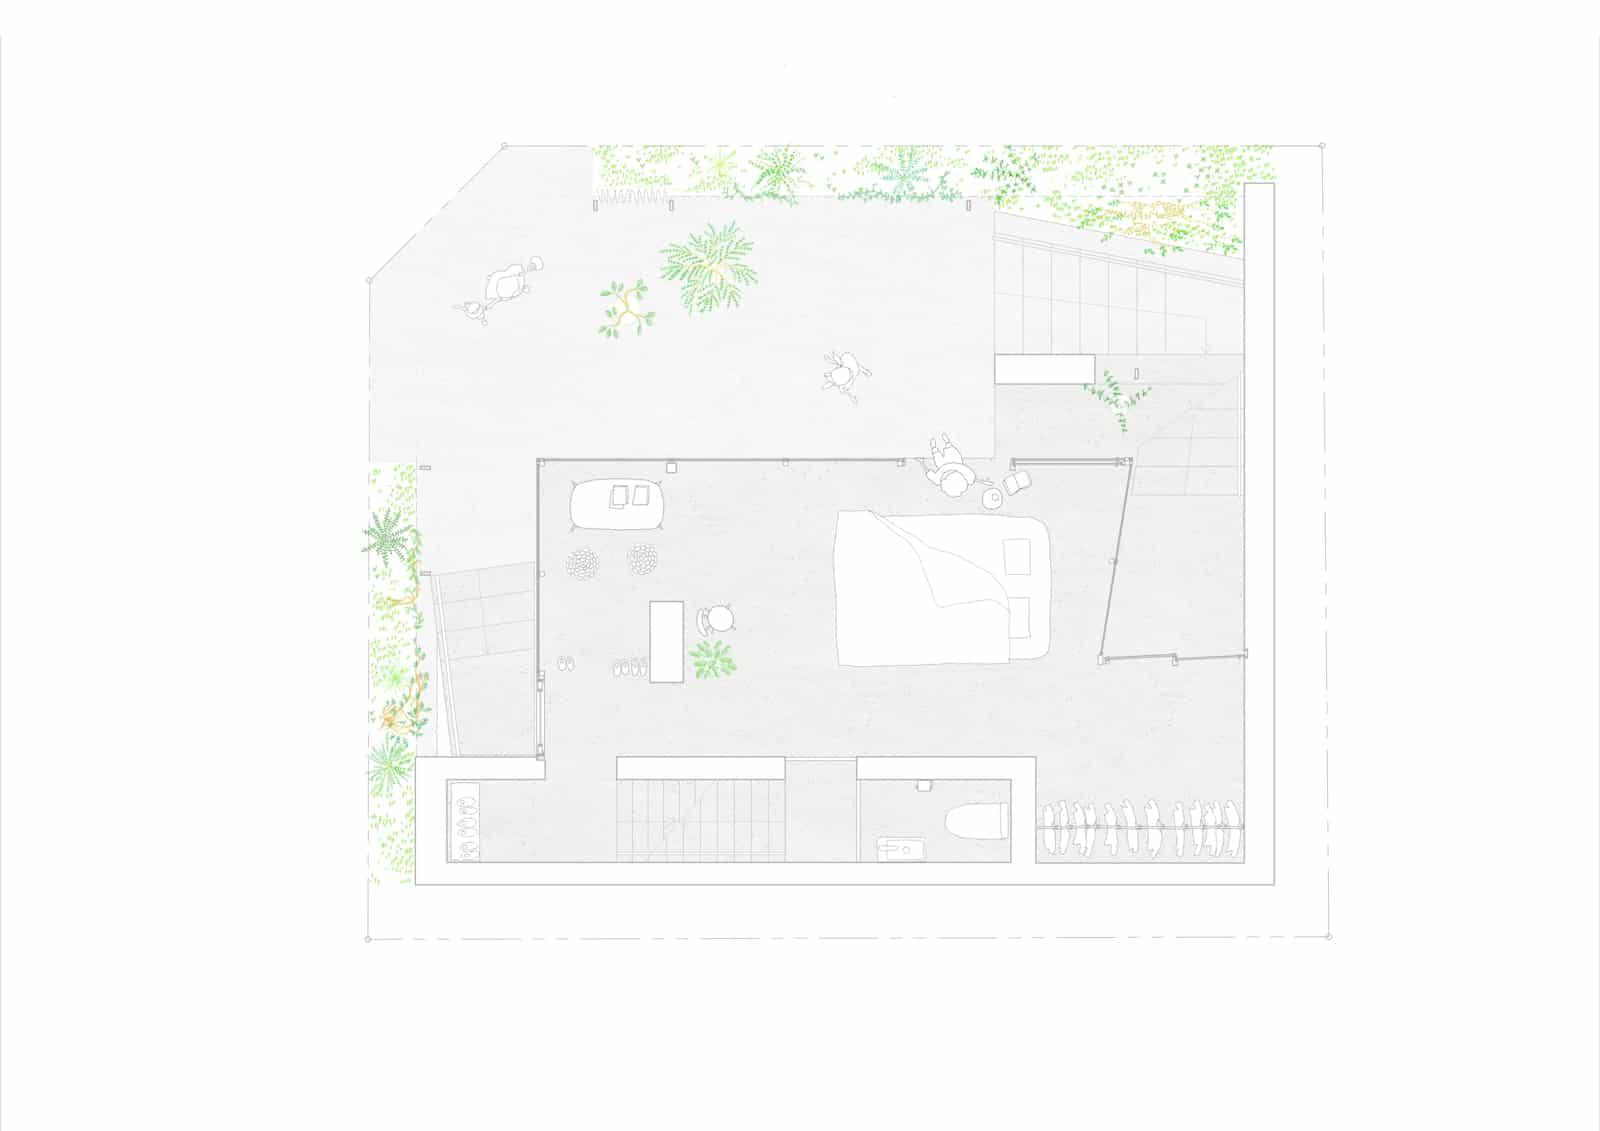 Weather House  - 20210827 NotArchitecsStudio WeatherHouse 11.1 56